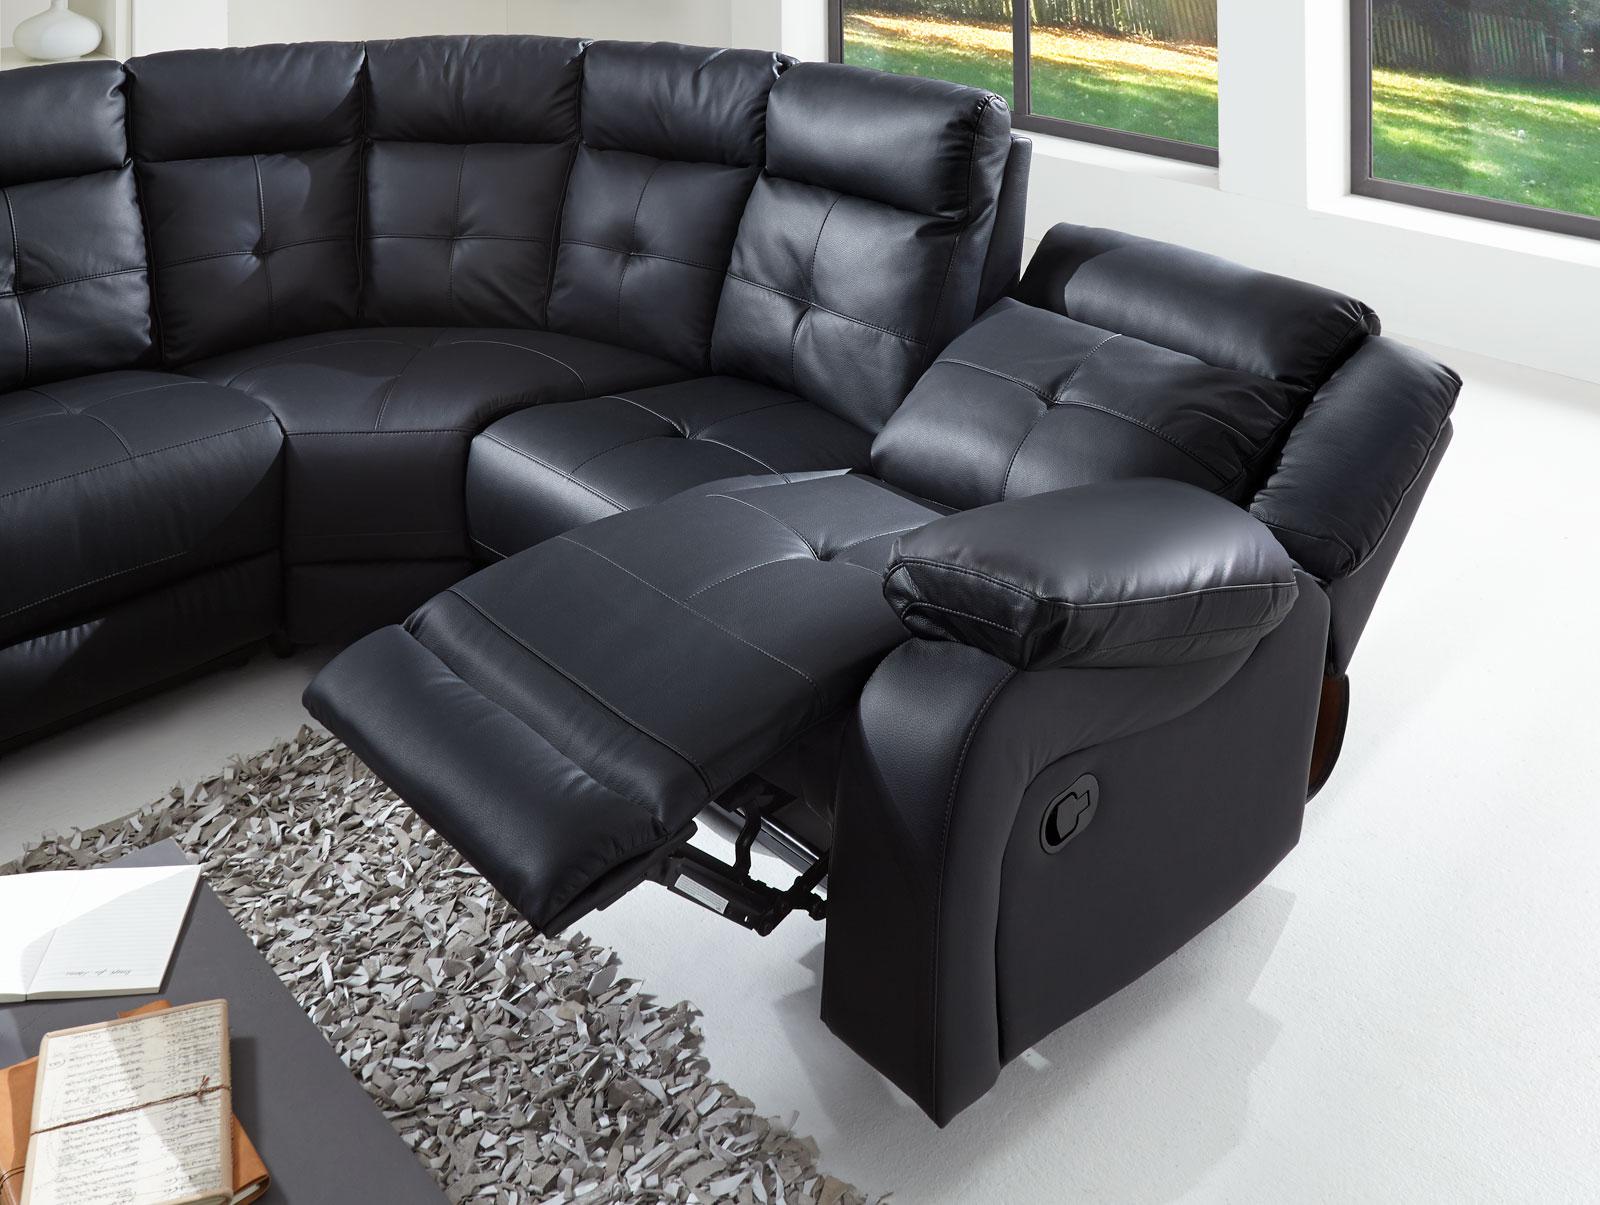 Sale ecksofa wohnlandschaft relaxsessel 190 cm schwarz alessio for Relaxsessel sale